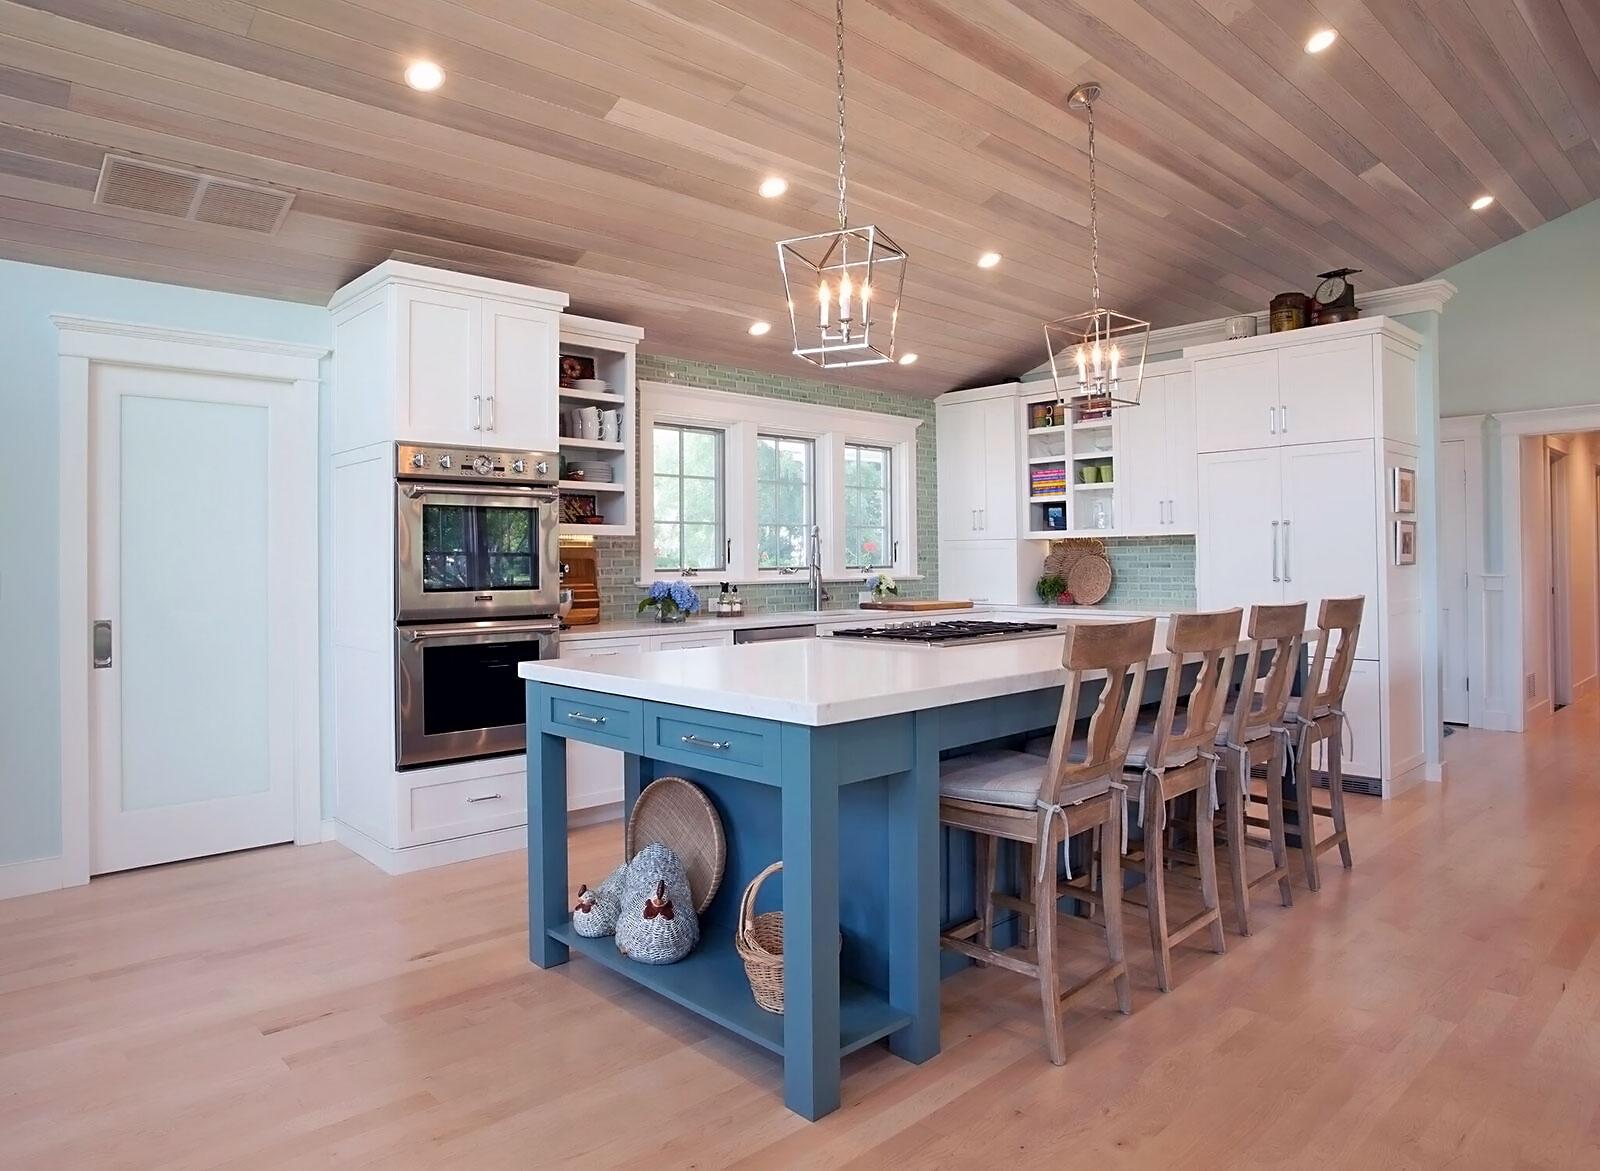 Stephen-Sullivan-Inc-Custom-Home-Builders-Rhode-Island-Narrow-River-Cottage---14